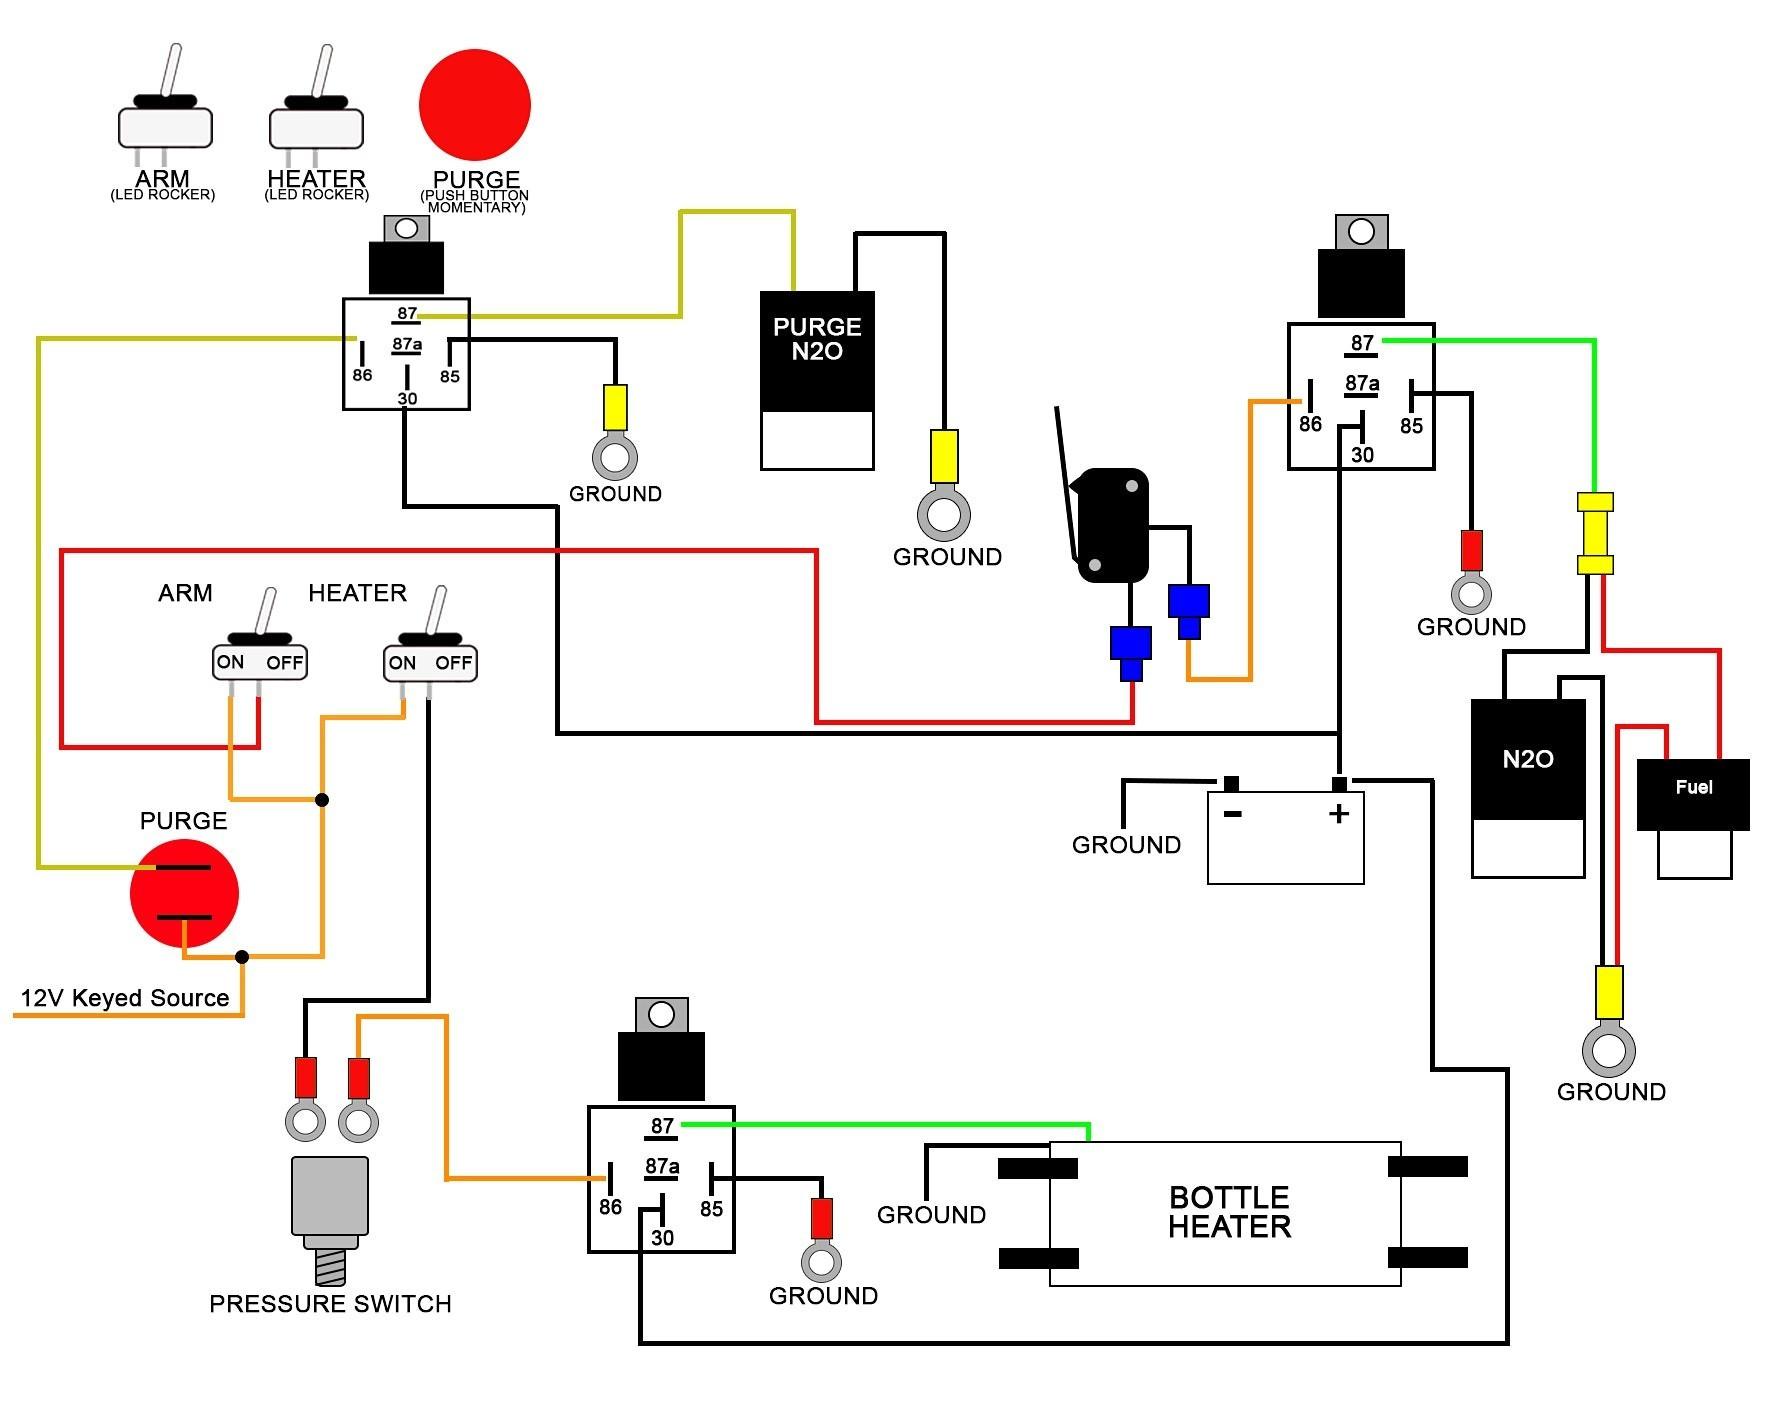 Indak 5 Pole Ignition Switch Wiring Diagram 6 Pin A Detailed Schematics On